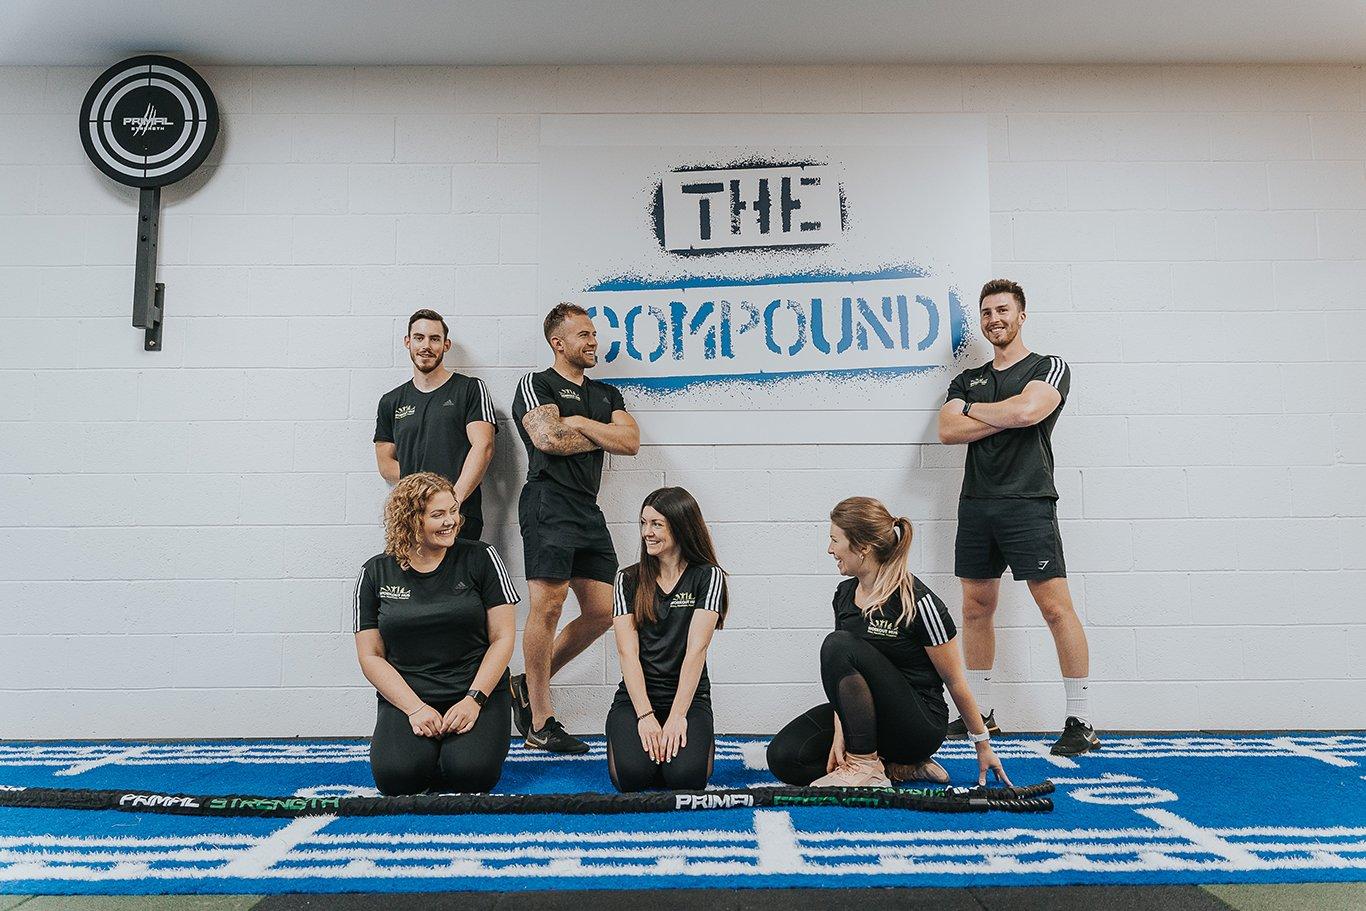 Team photo of gym instructors